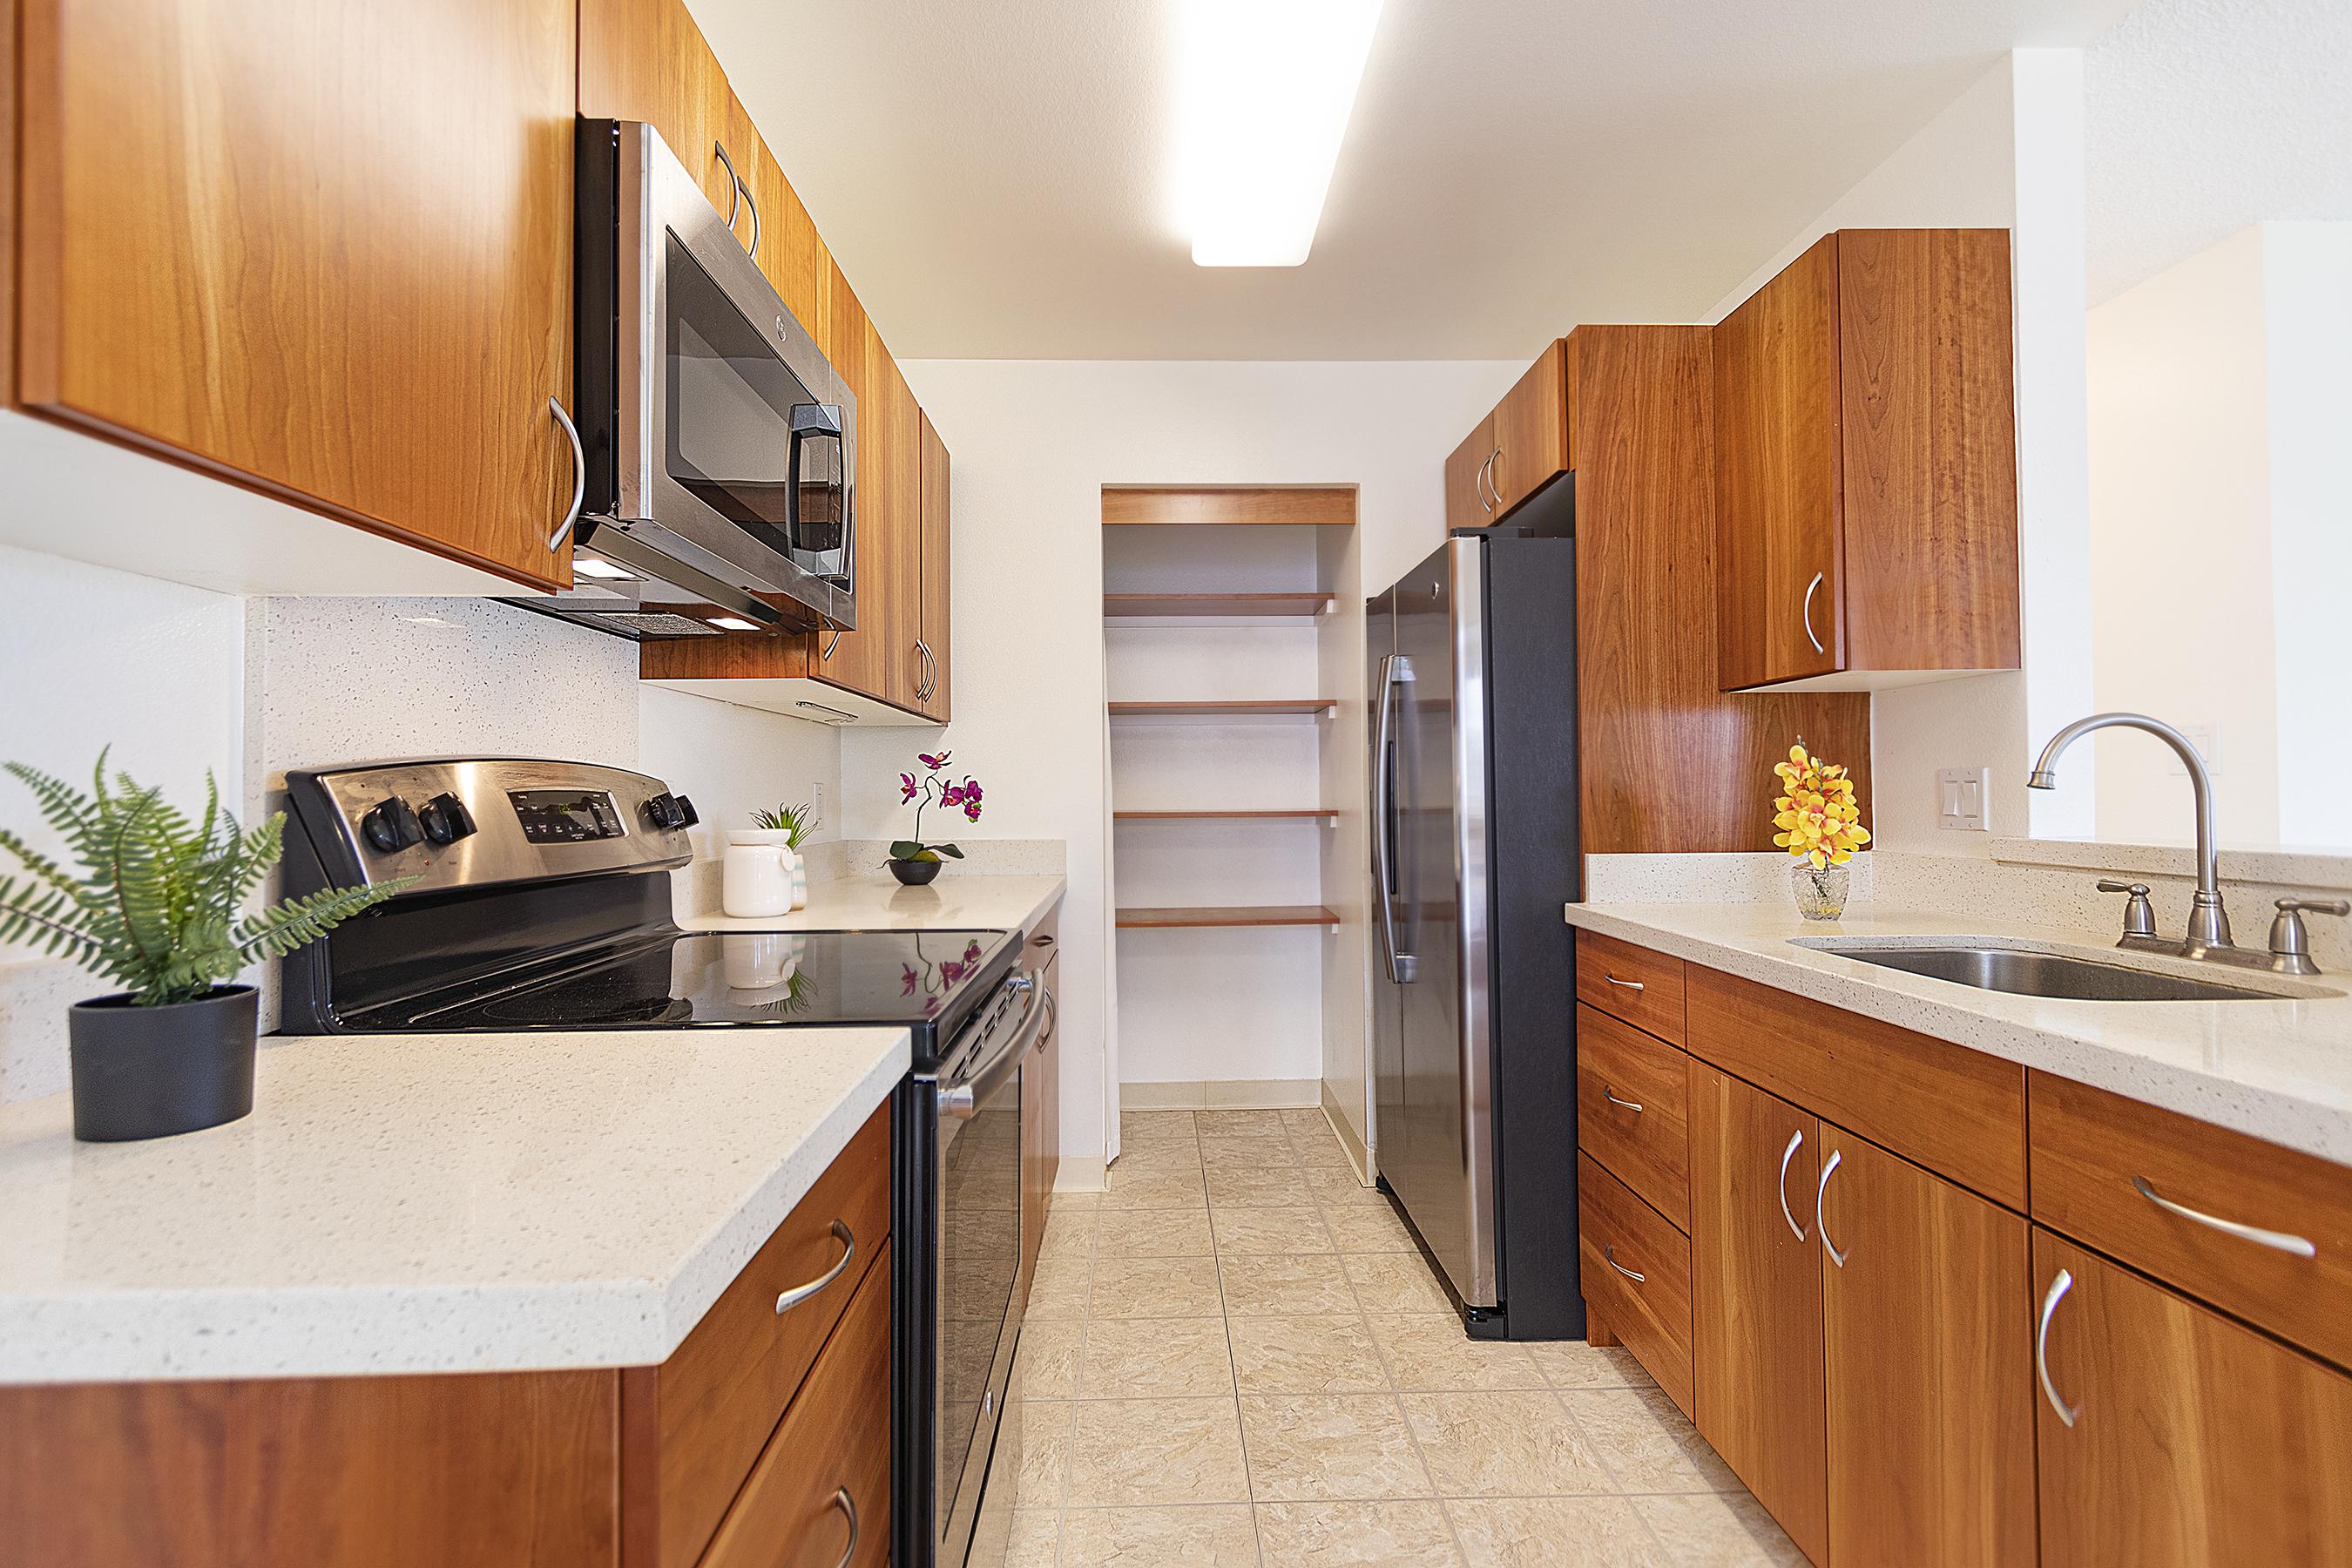 Kitchen at 94-870 Lumiauau St #Y201